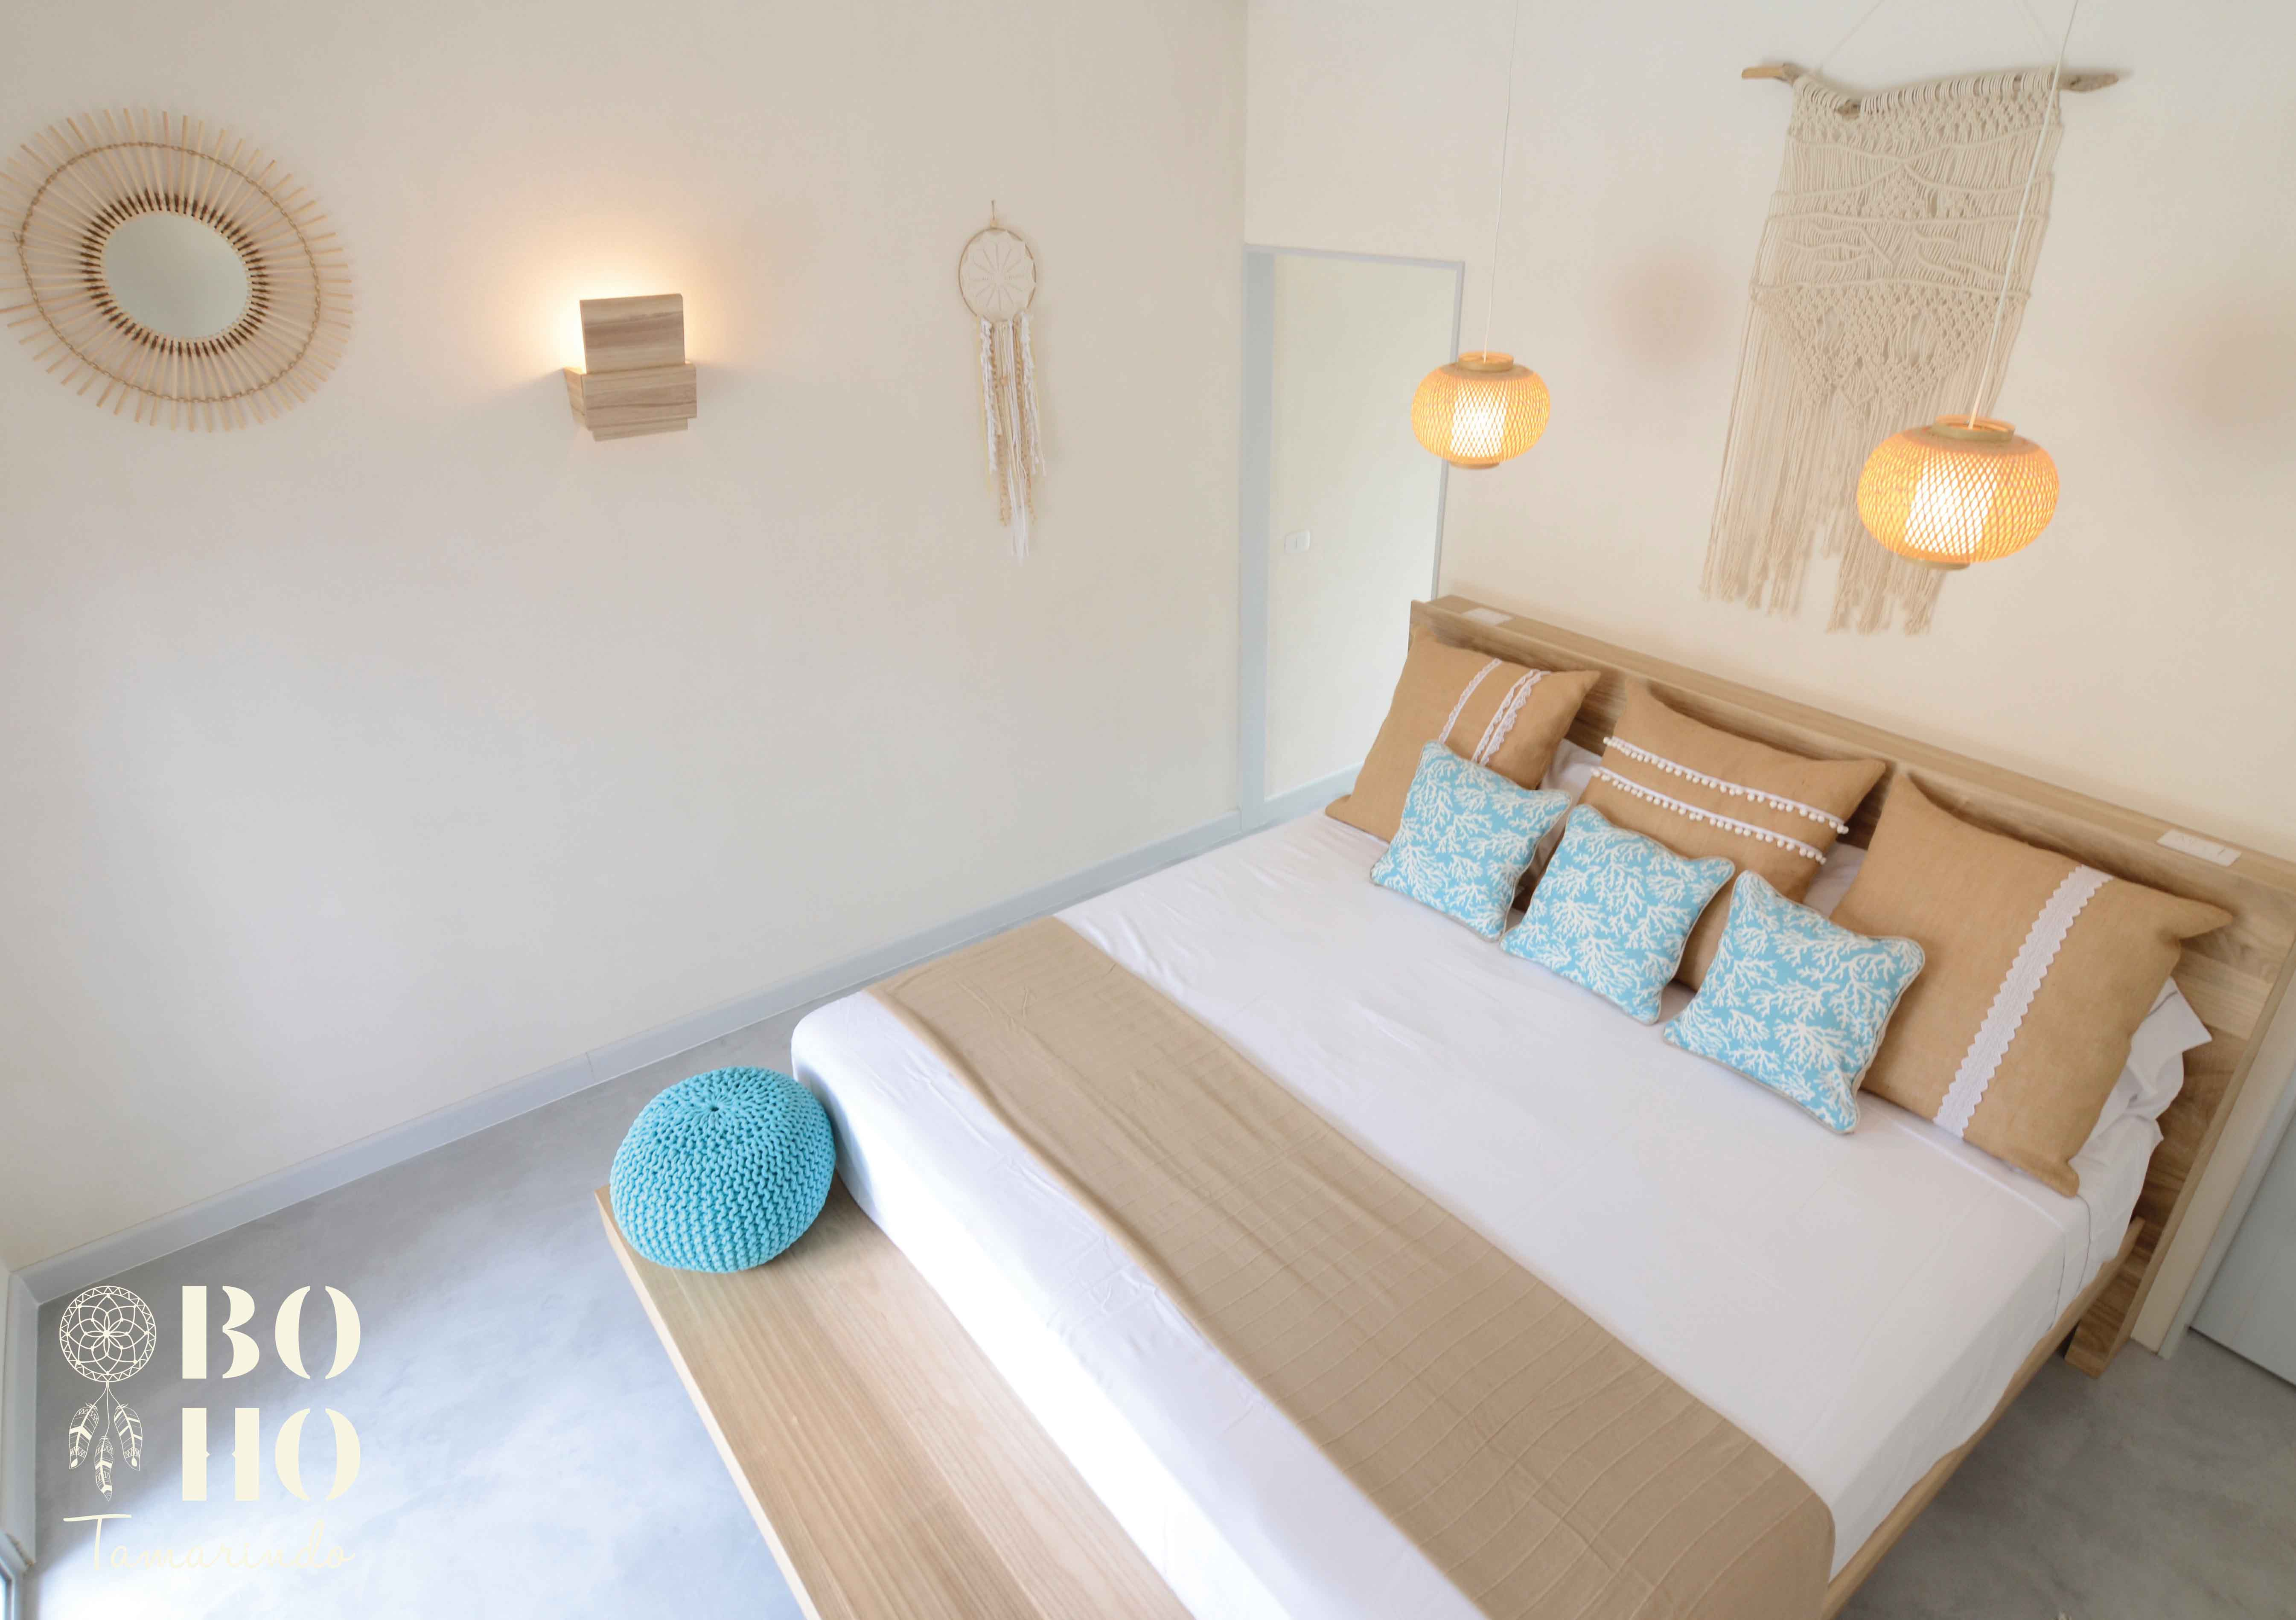 Turquoize room BoHo CR